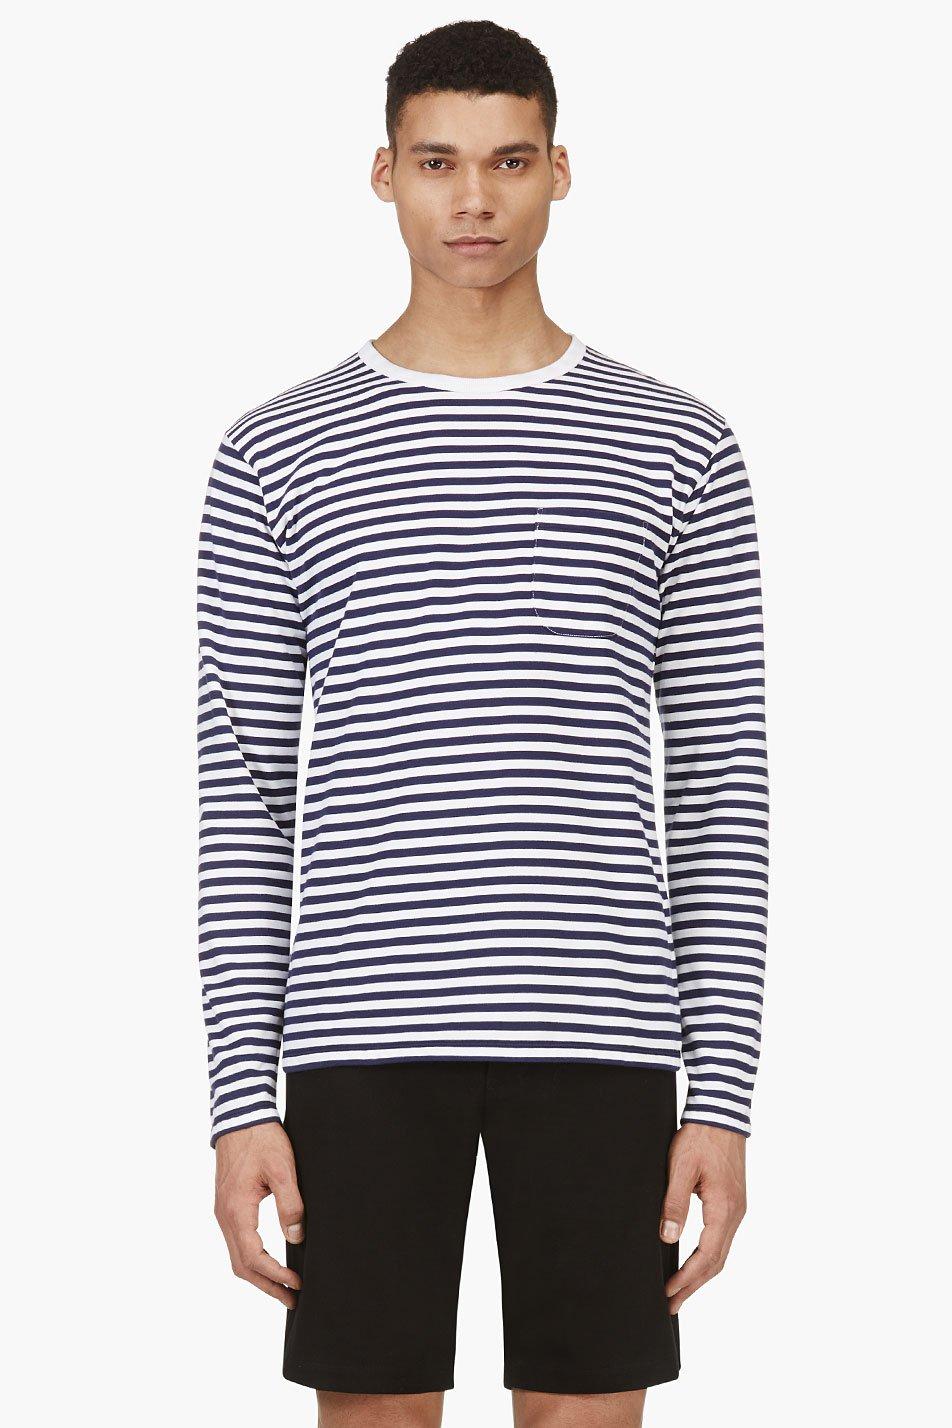 Nanamica navy long sleeve stripe coolmax t shirt in blue for Navy blue striped long sleeve shirt